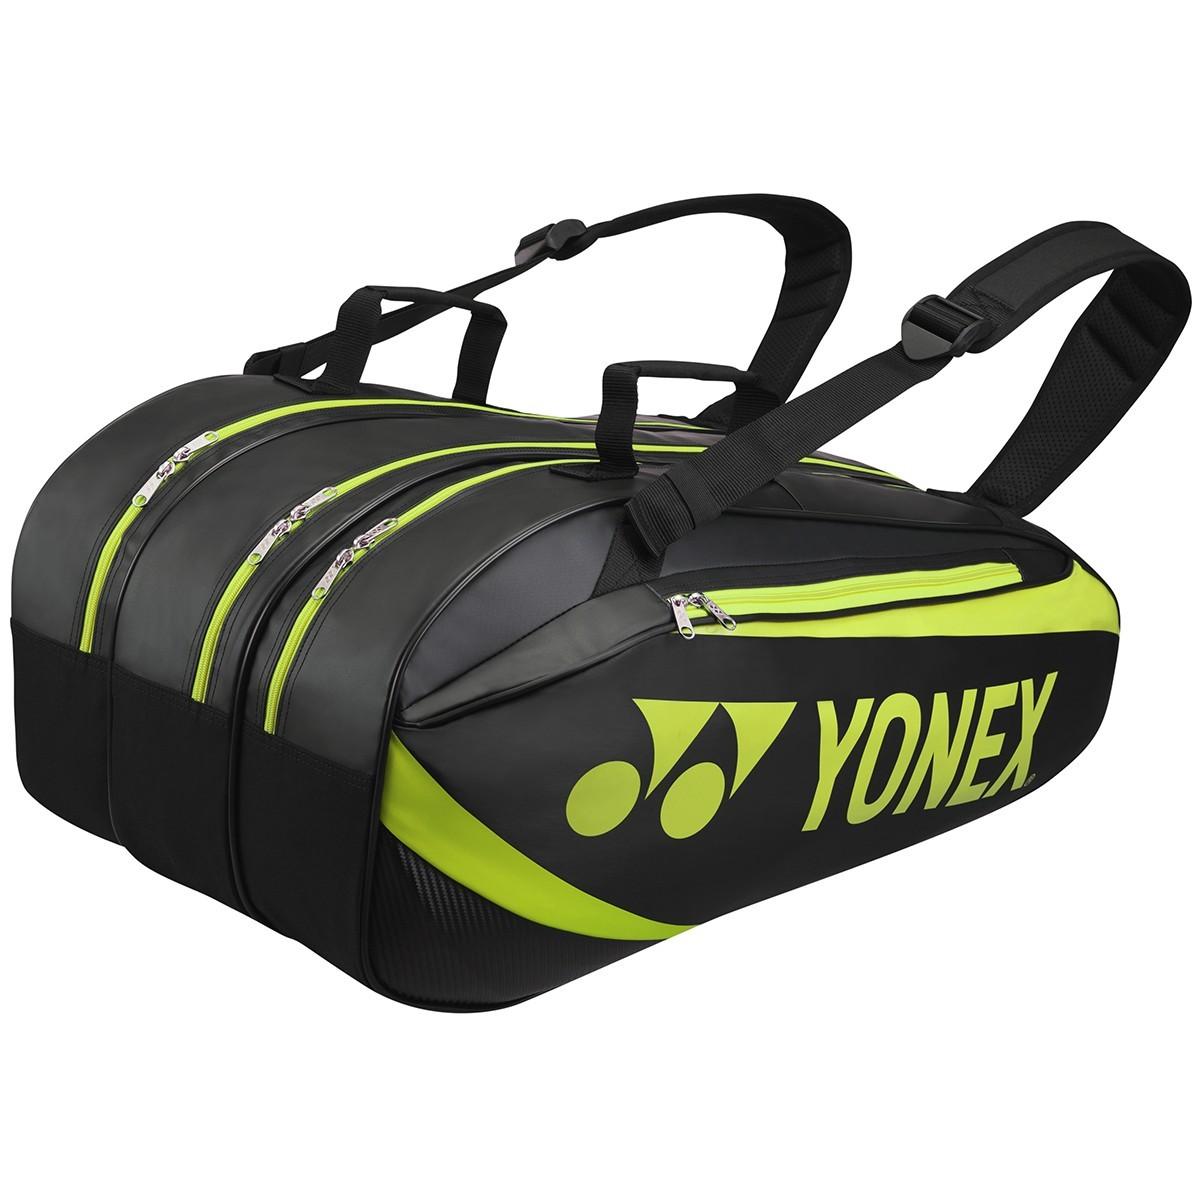 Torba tenisowa Yonex Tournament Active Bag 9 Black / Lime